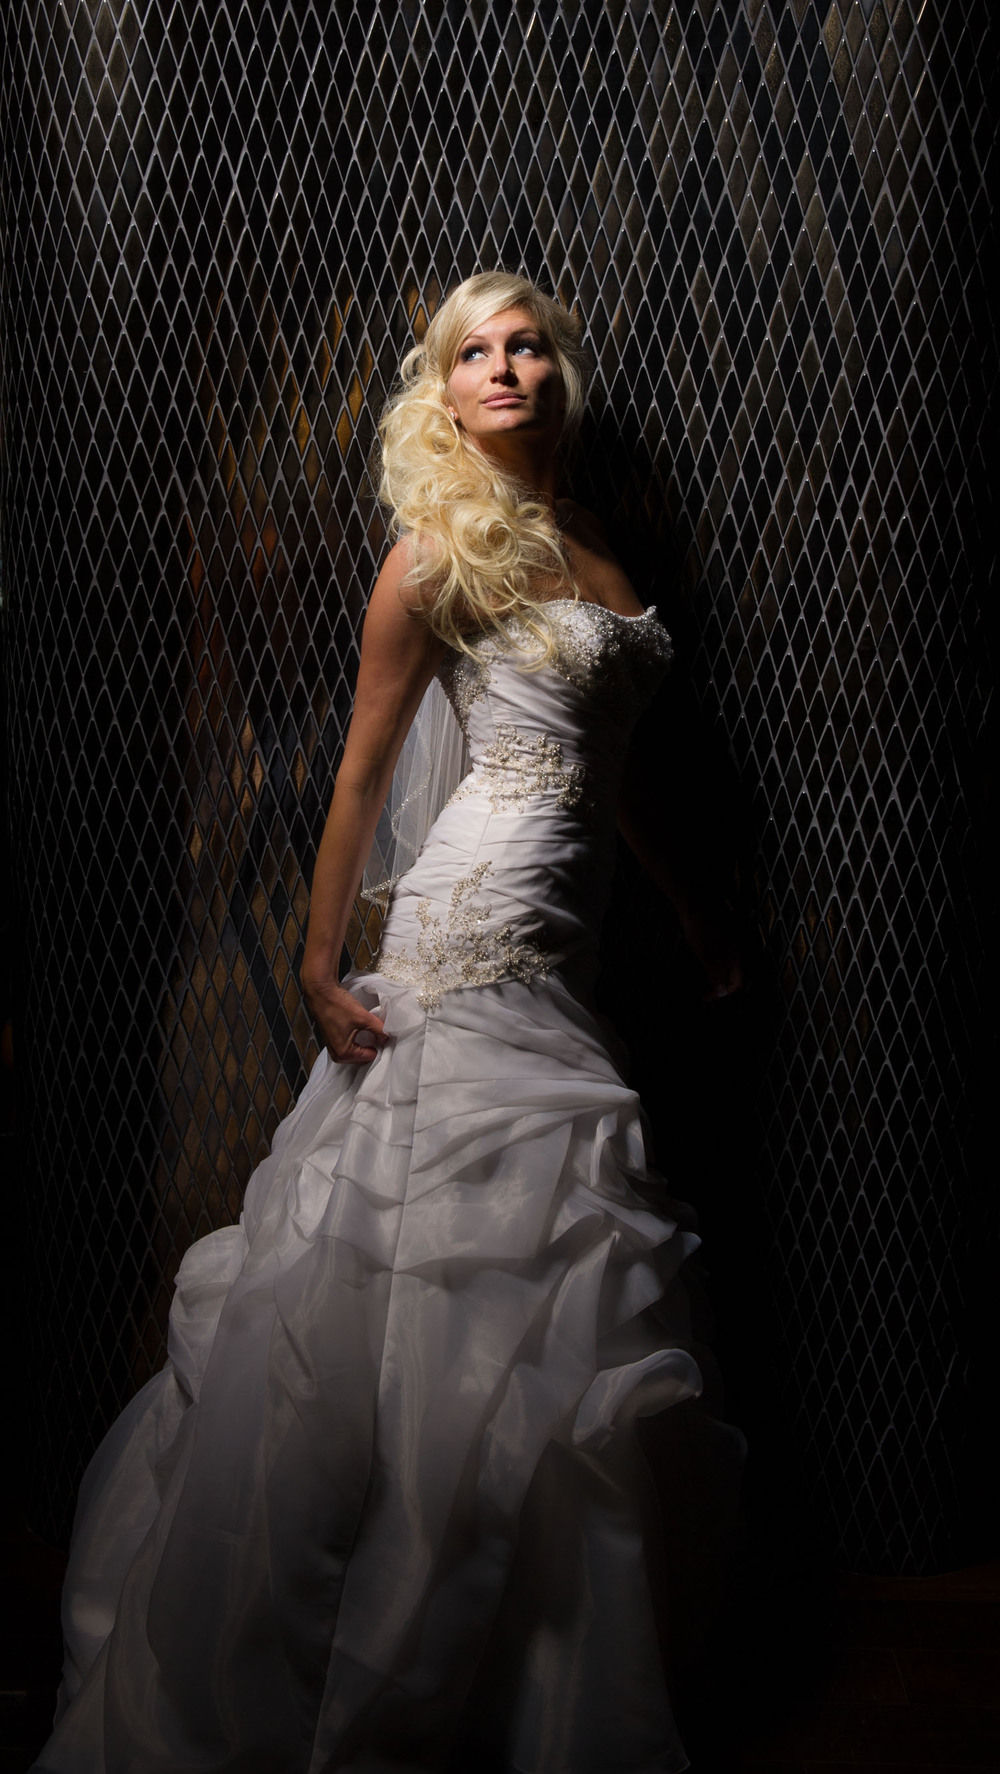 stewart_bertrand_wedding_photography_smblogwed-1008.jpg